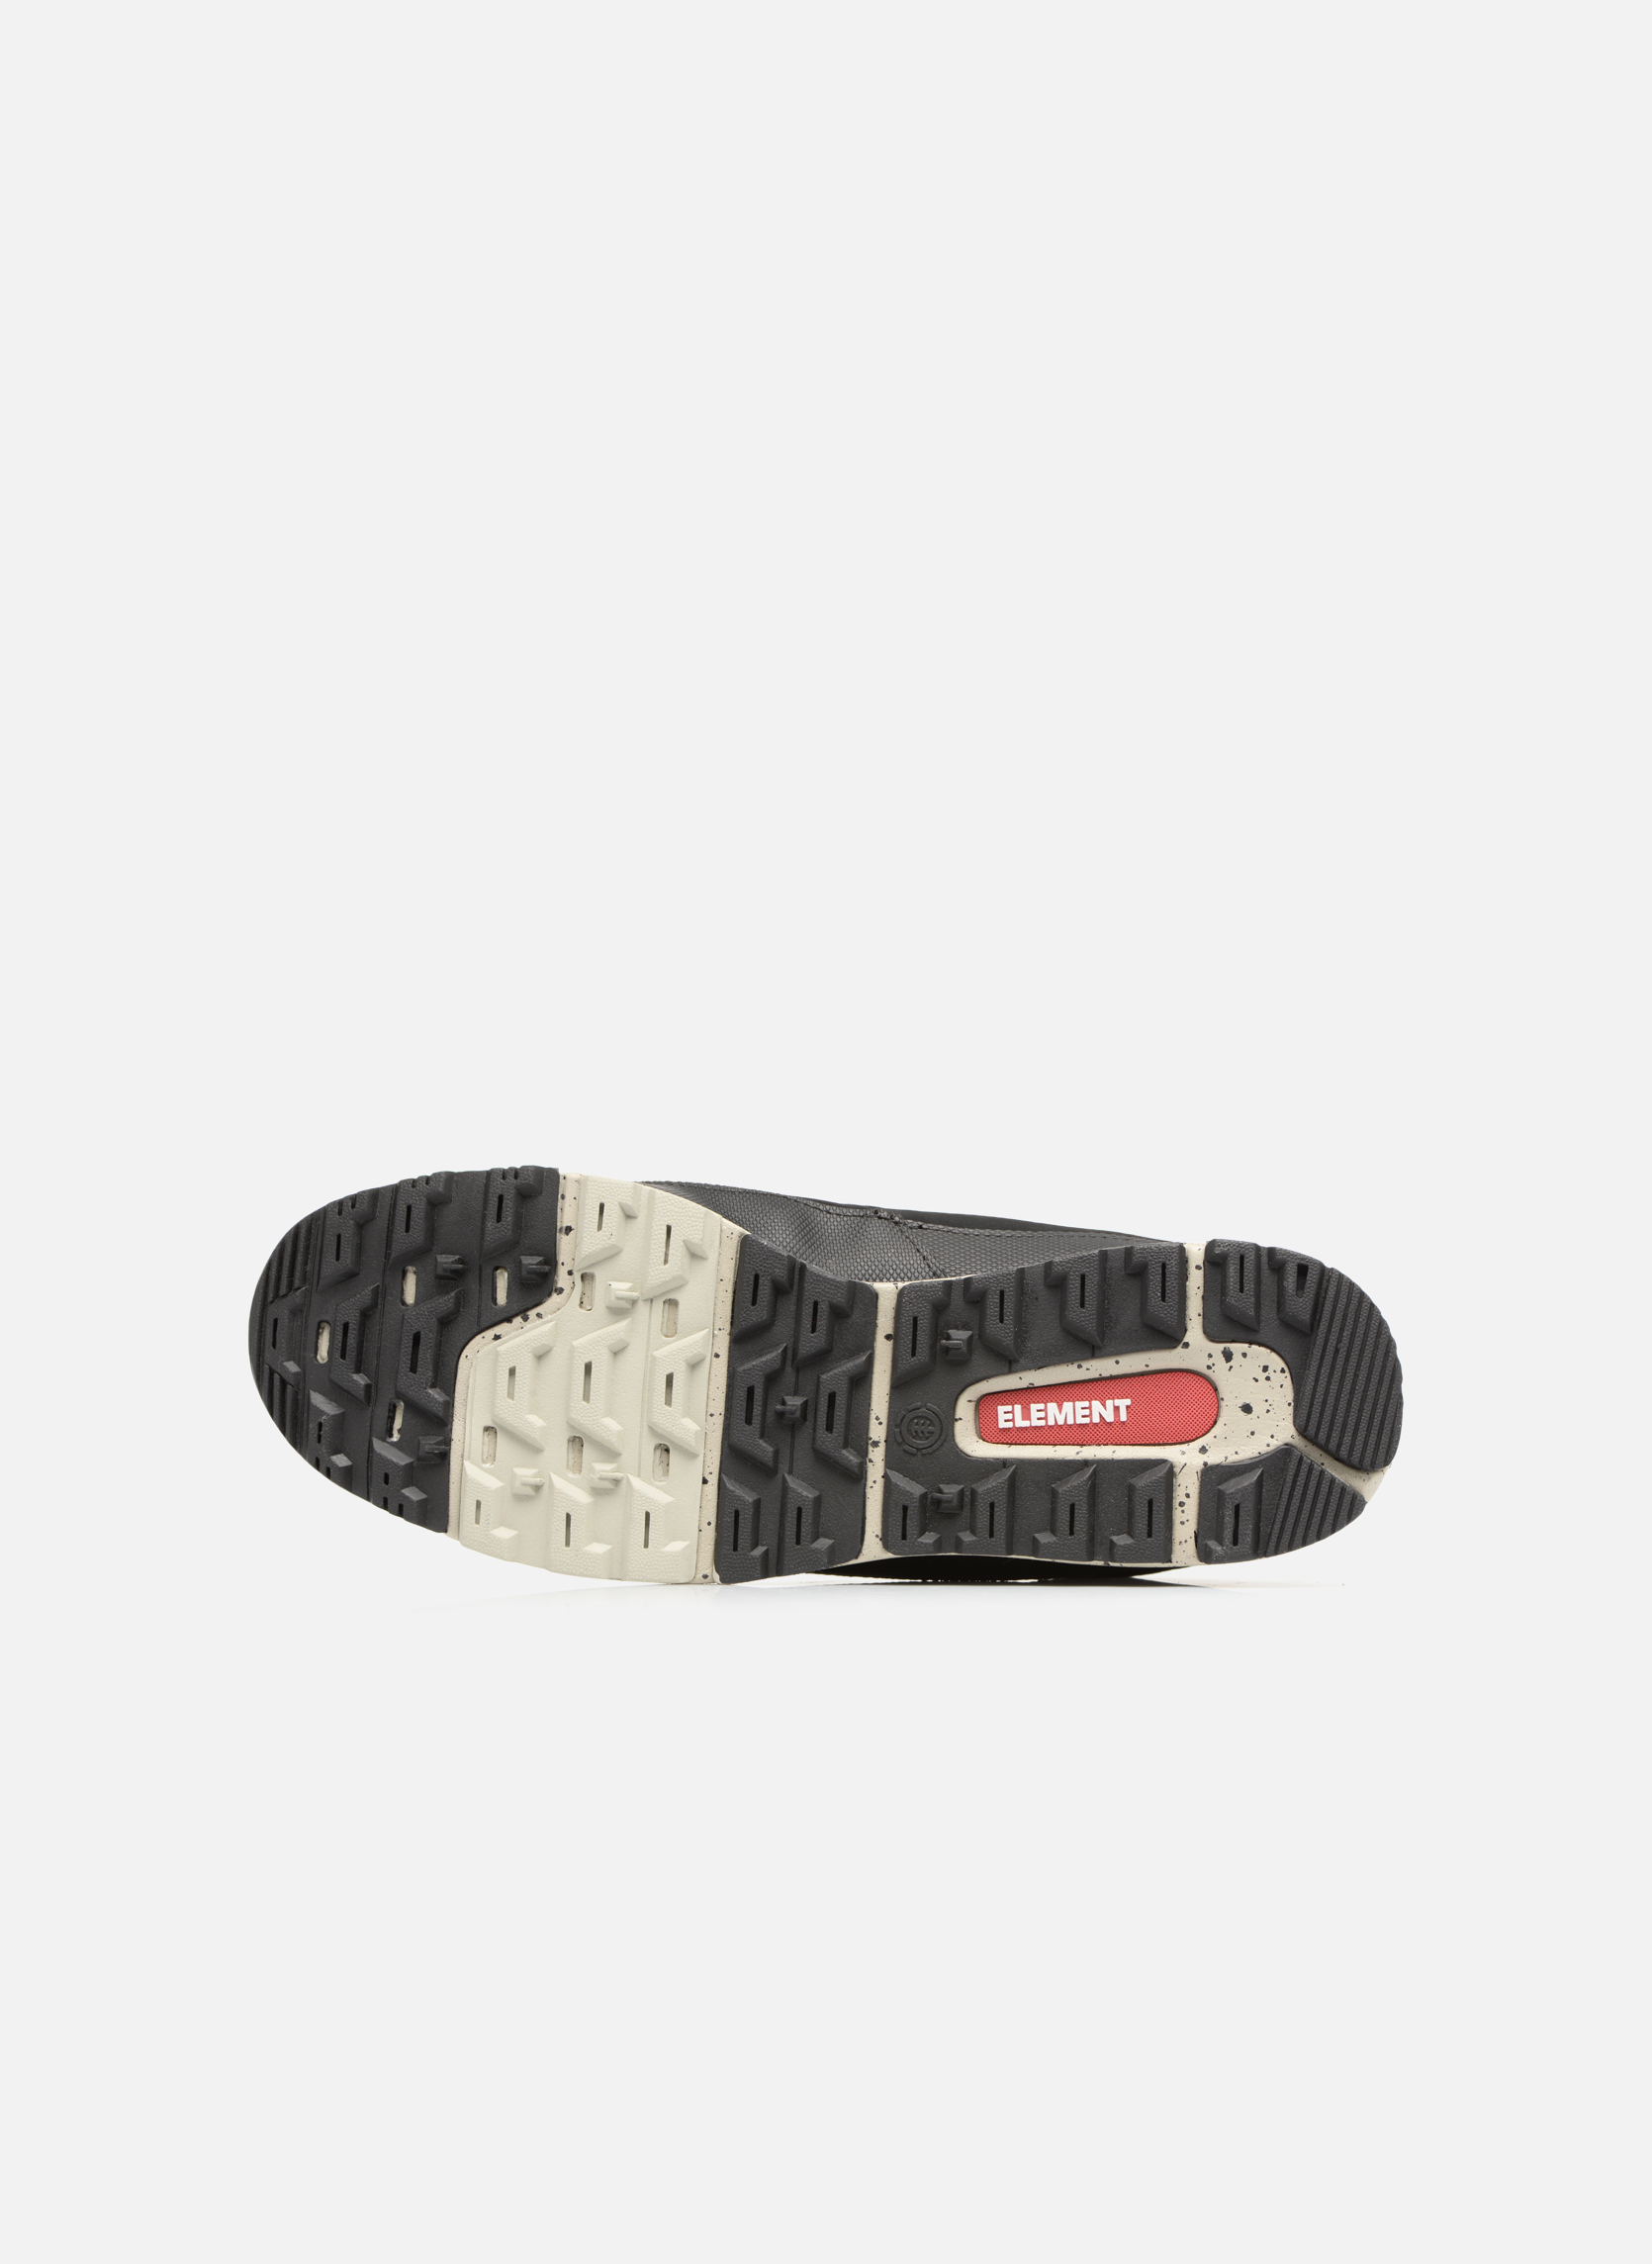 Donnelly Black Greyfull Grain Leather